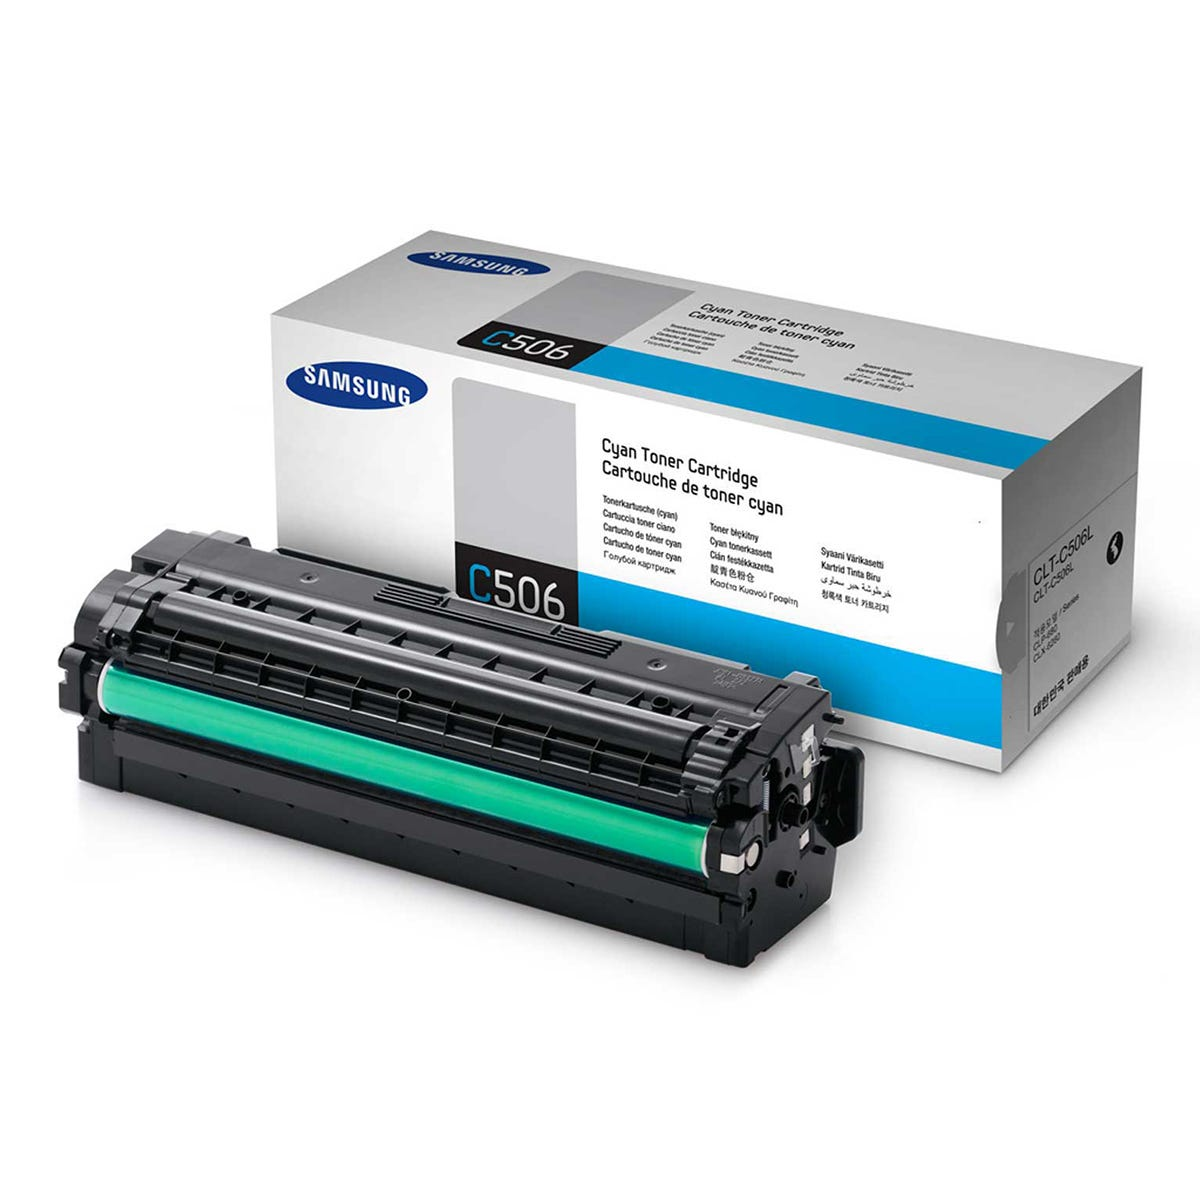 Samsung CLT-506L Inkjet Toner Cartridge, Cyan